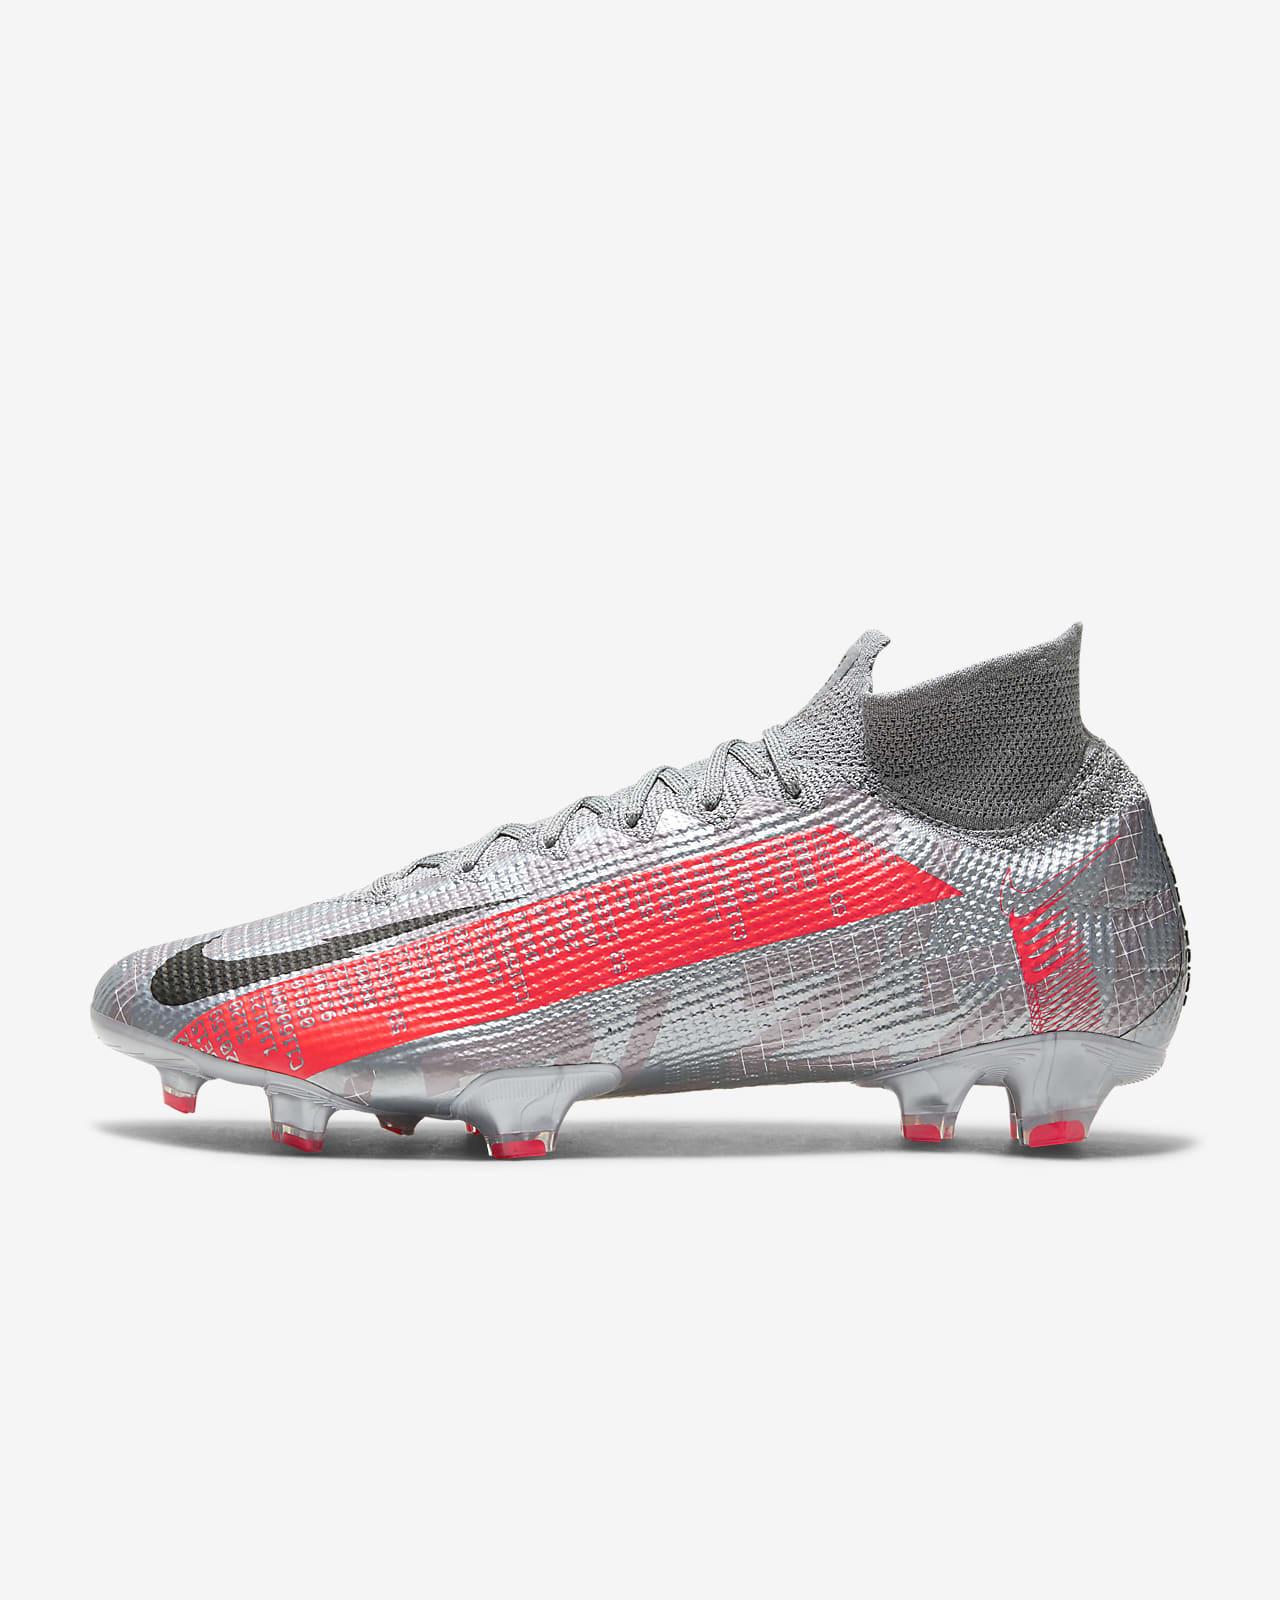 Elite FG Firm-Ground Football Boot. Nike DK